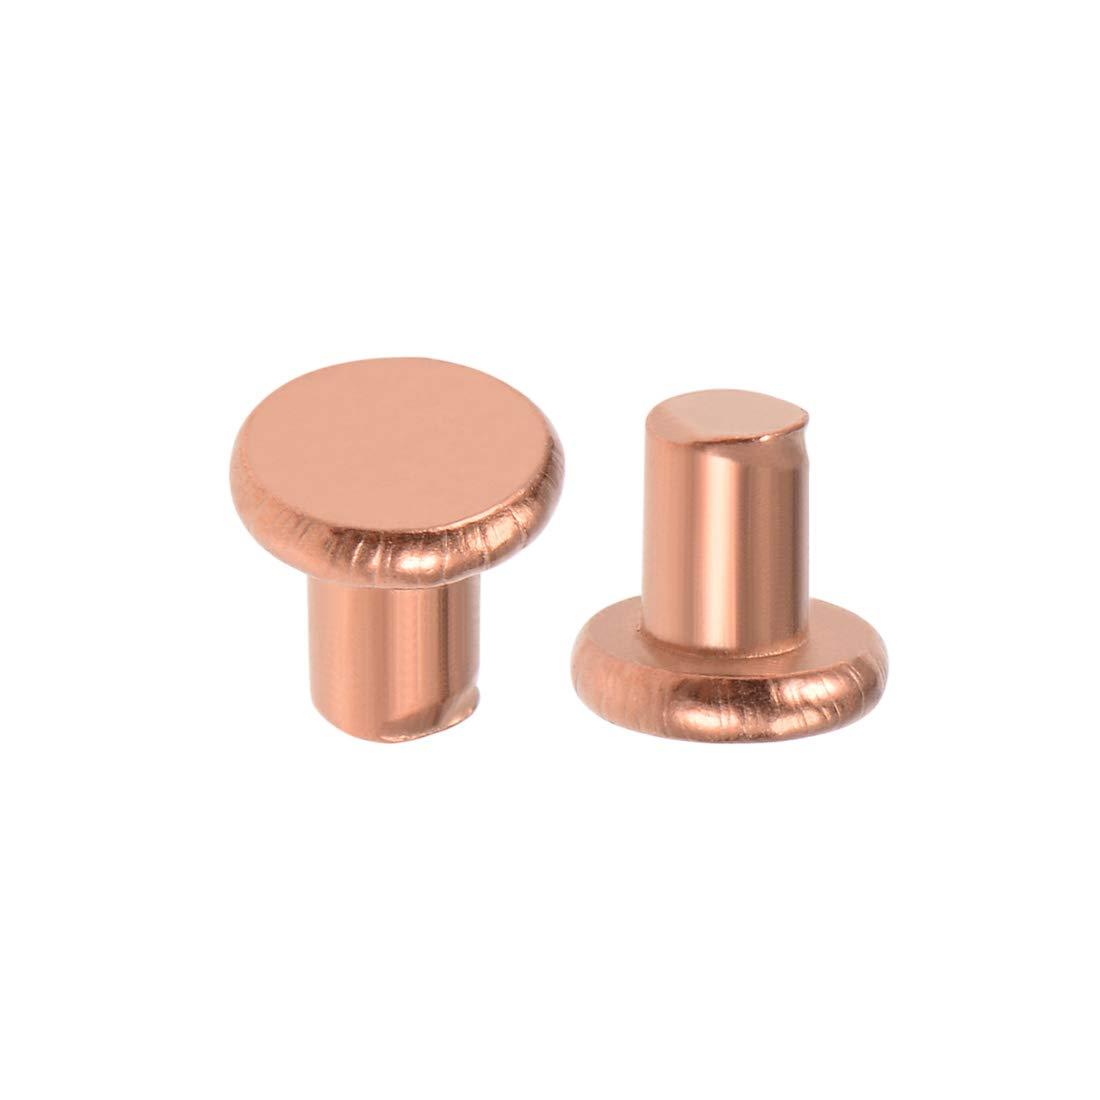 sourcing map 100 Pcs 5//64 x5//32 Flat Head Copper Solid Rivets Fasteners